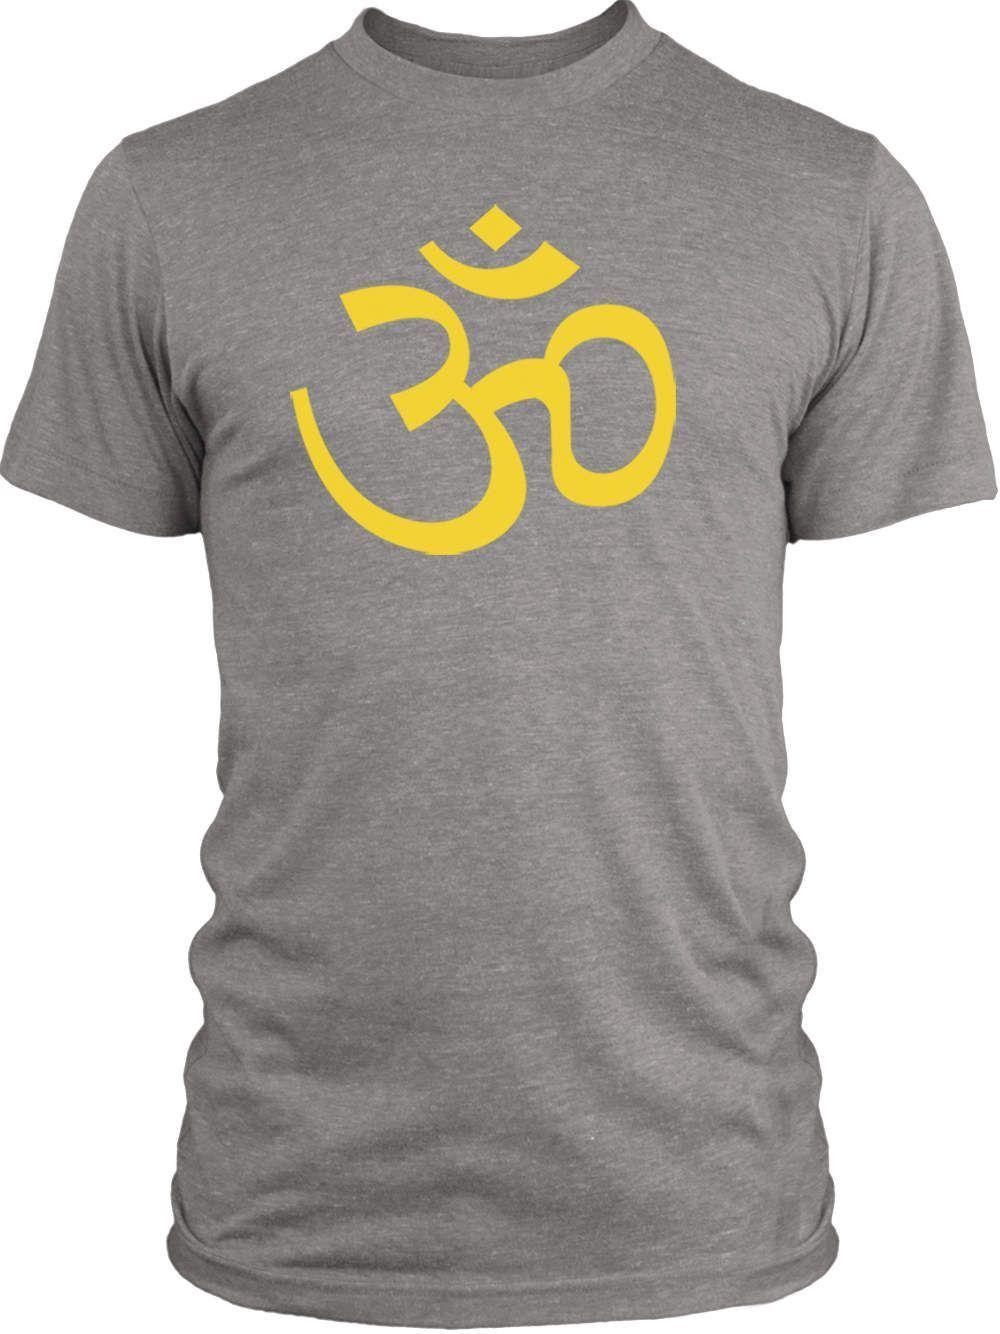 Big Texas Golden Om Symbol (Yellow) Vintage Tri-Blend T-Shirt